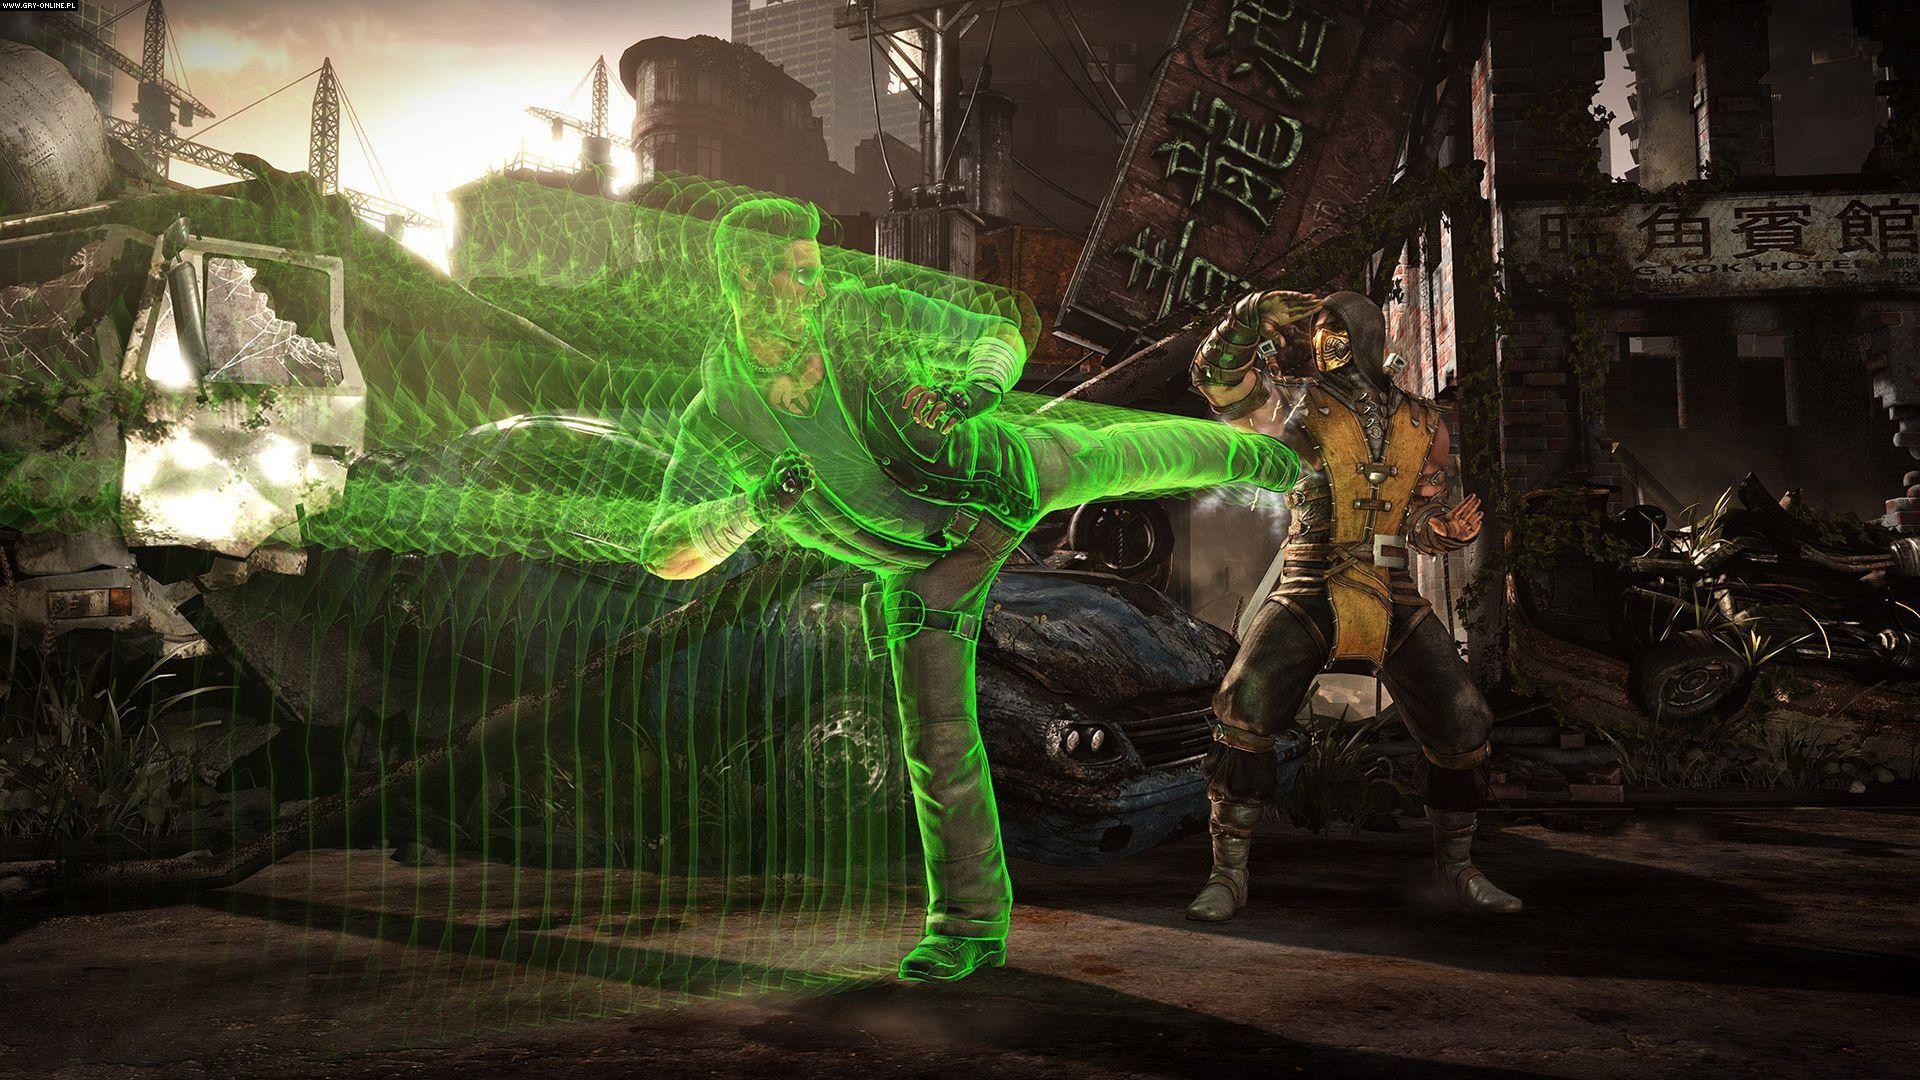 Mortal Kombat X image #6